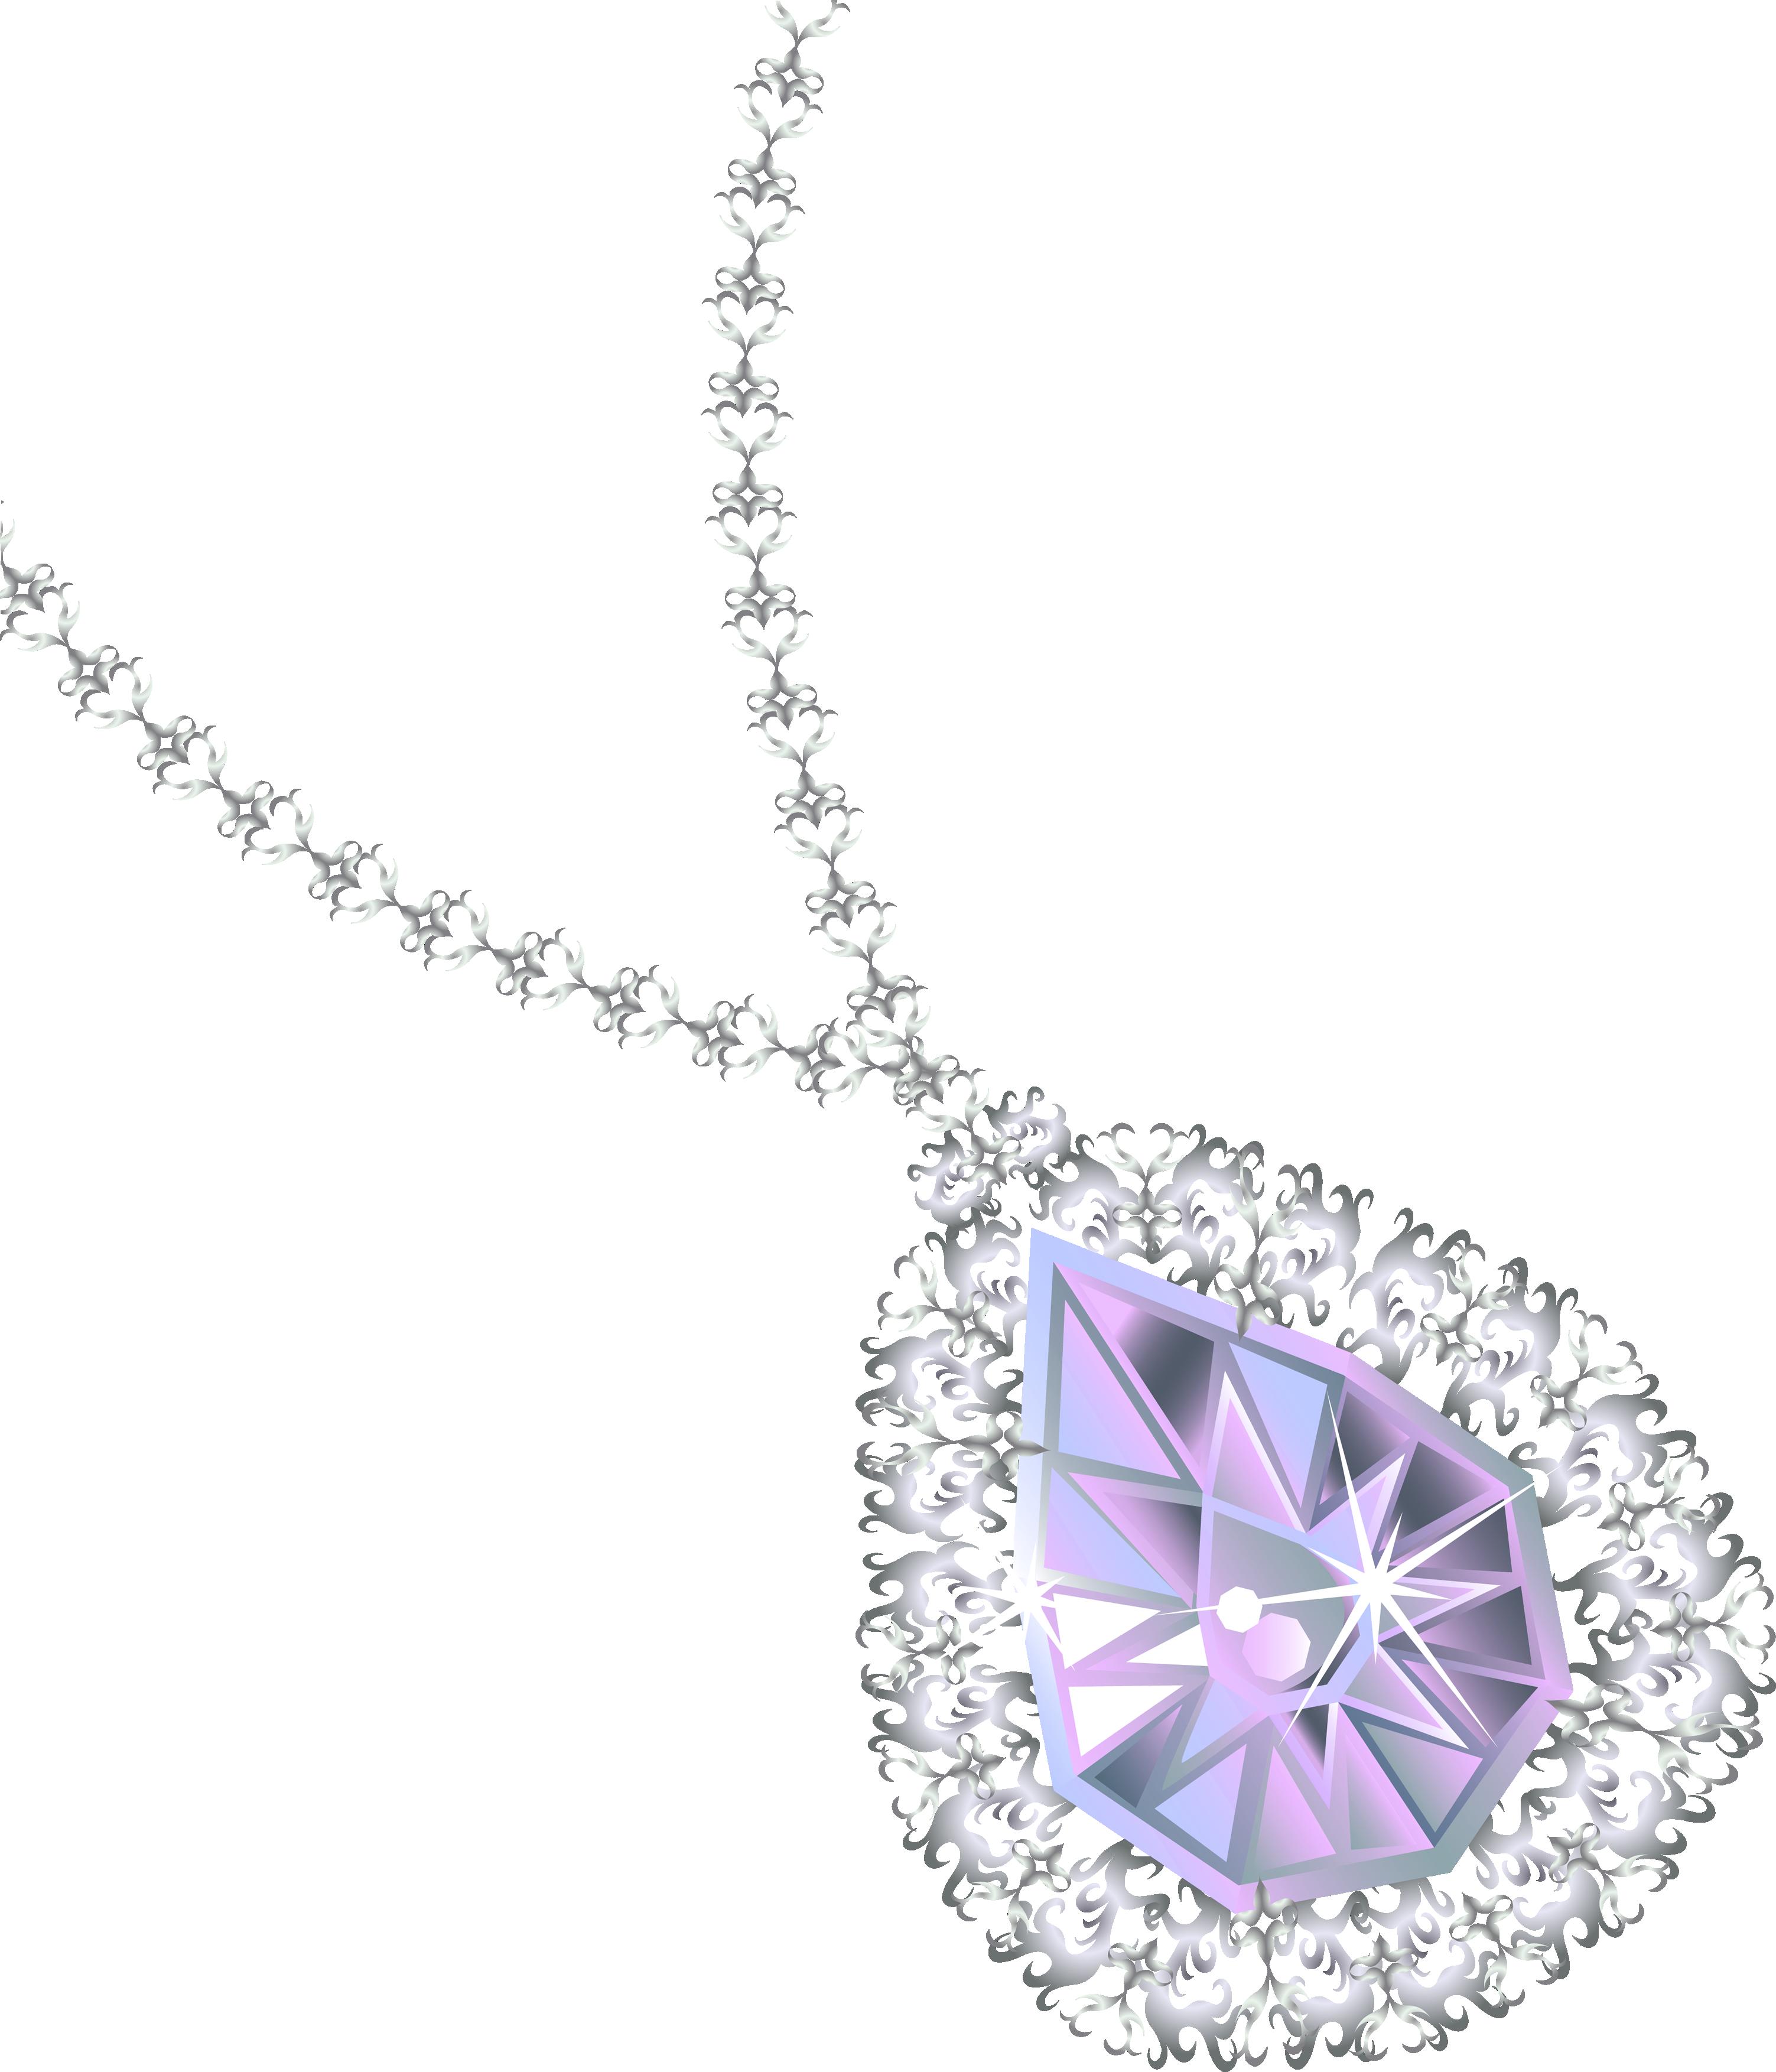 Diamond Necklace Png Image Gemstone Jewellery Design Gold Body Jewellery Diamond